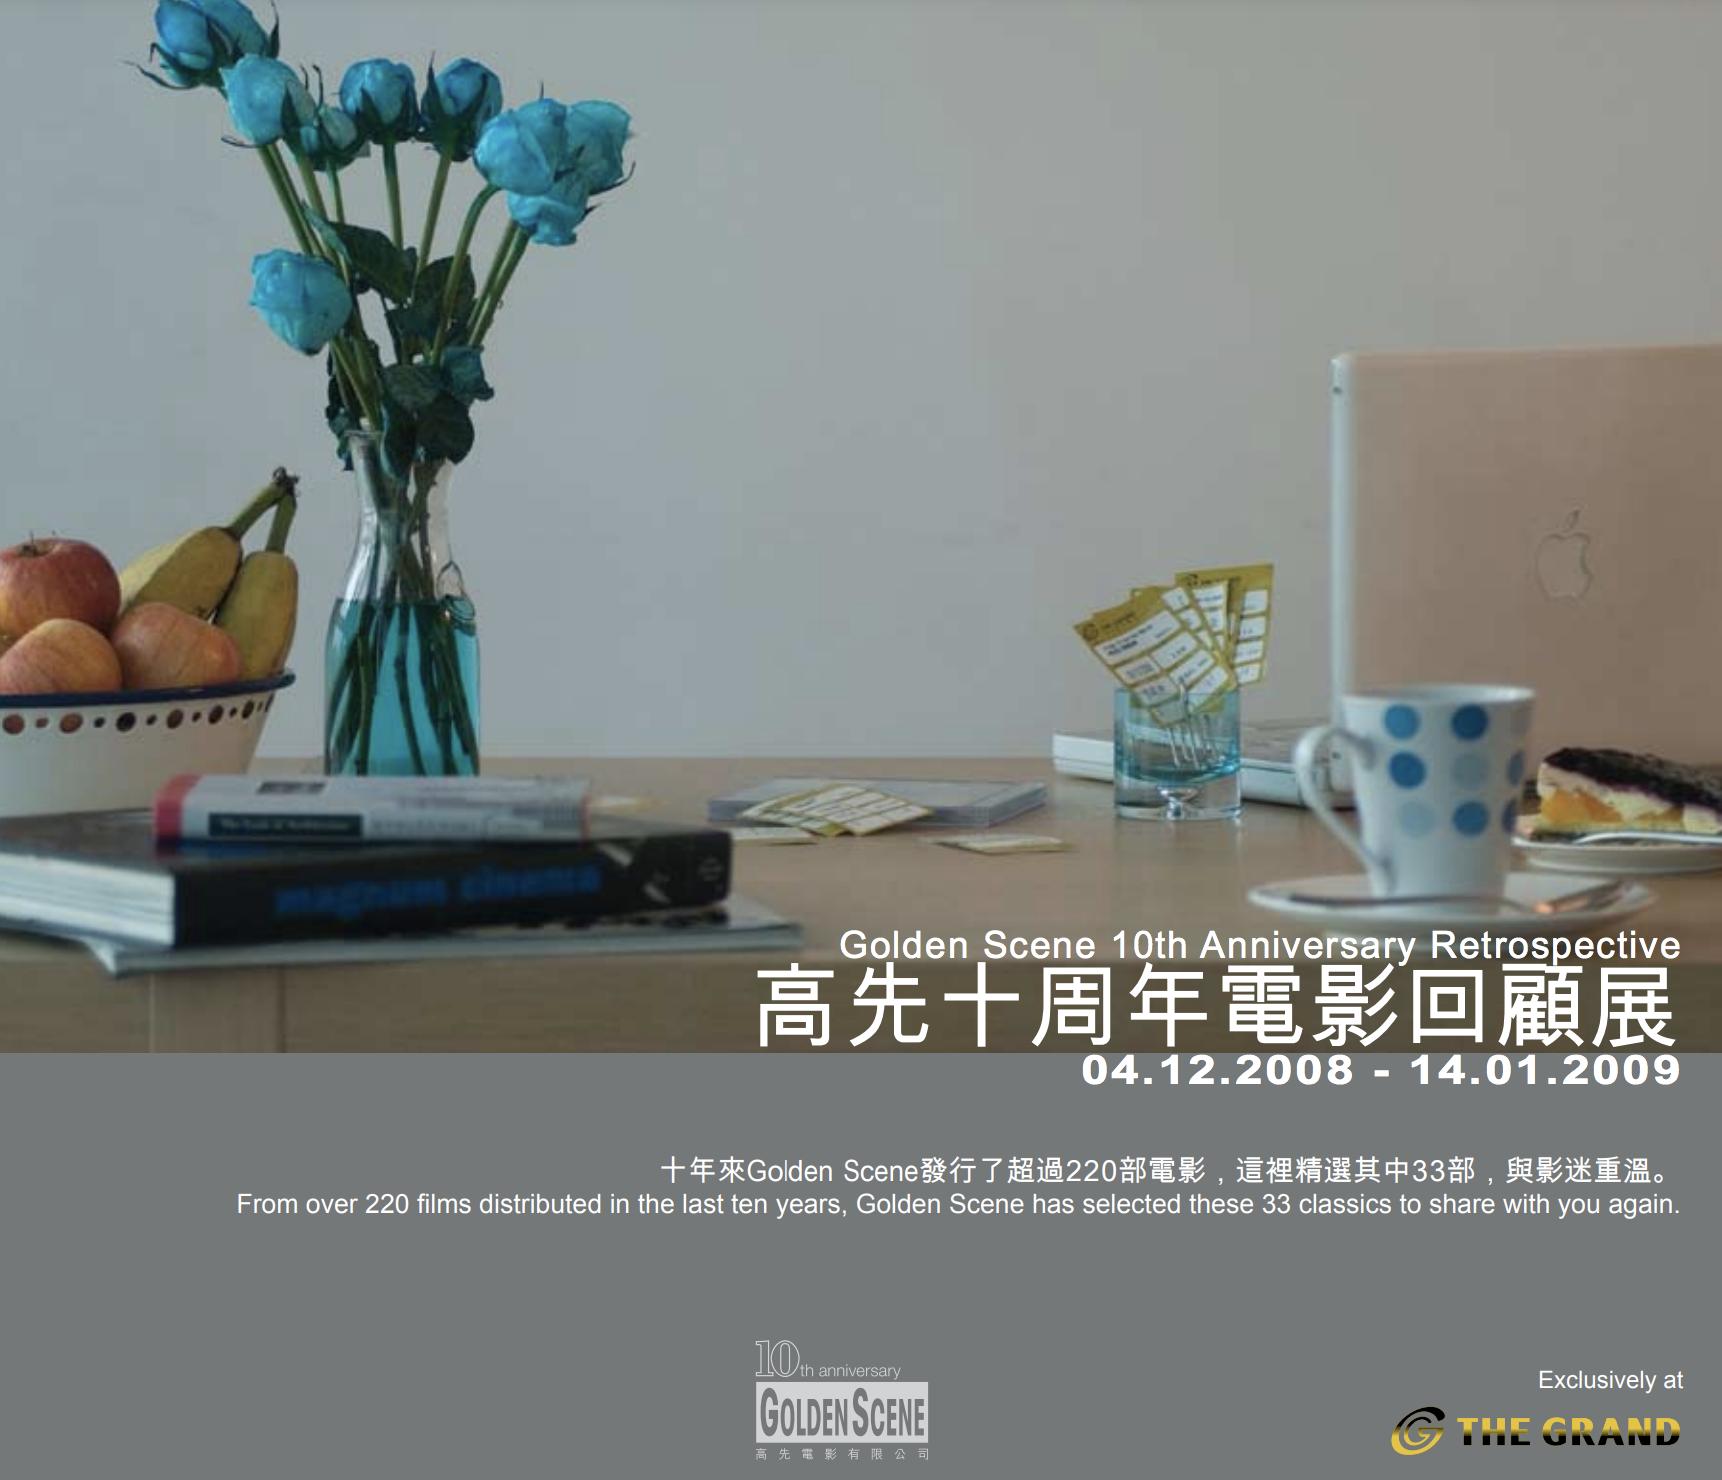 Golden Scene 高先 十周年電影回顧展 poster